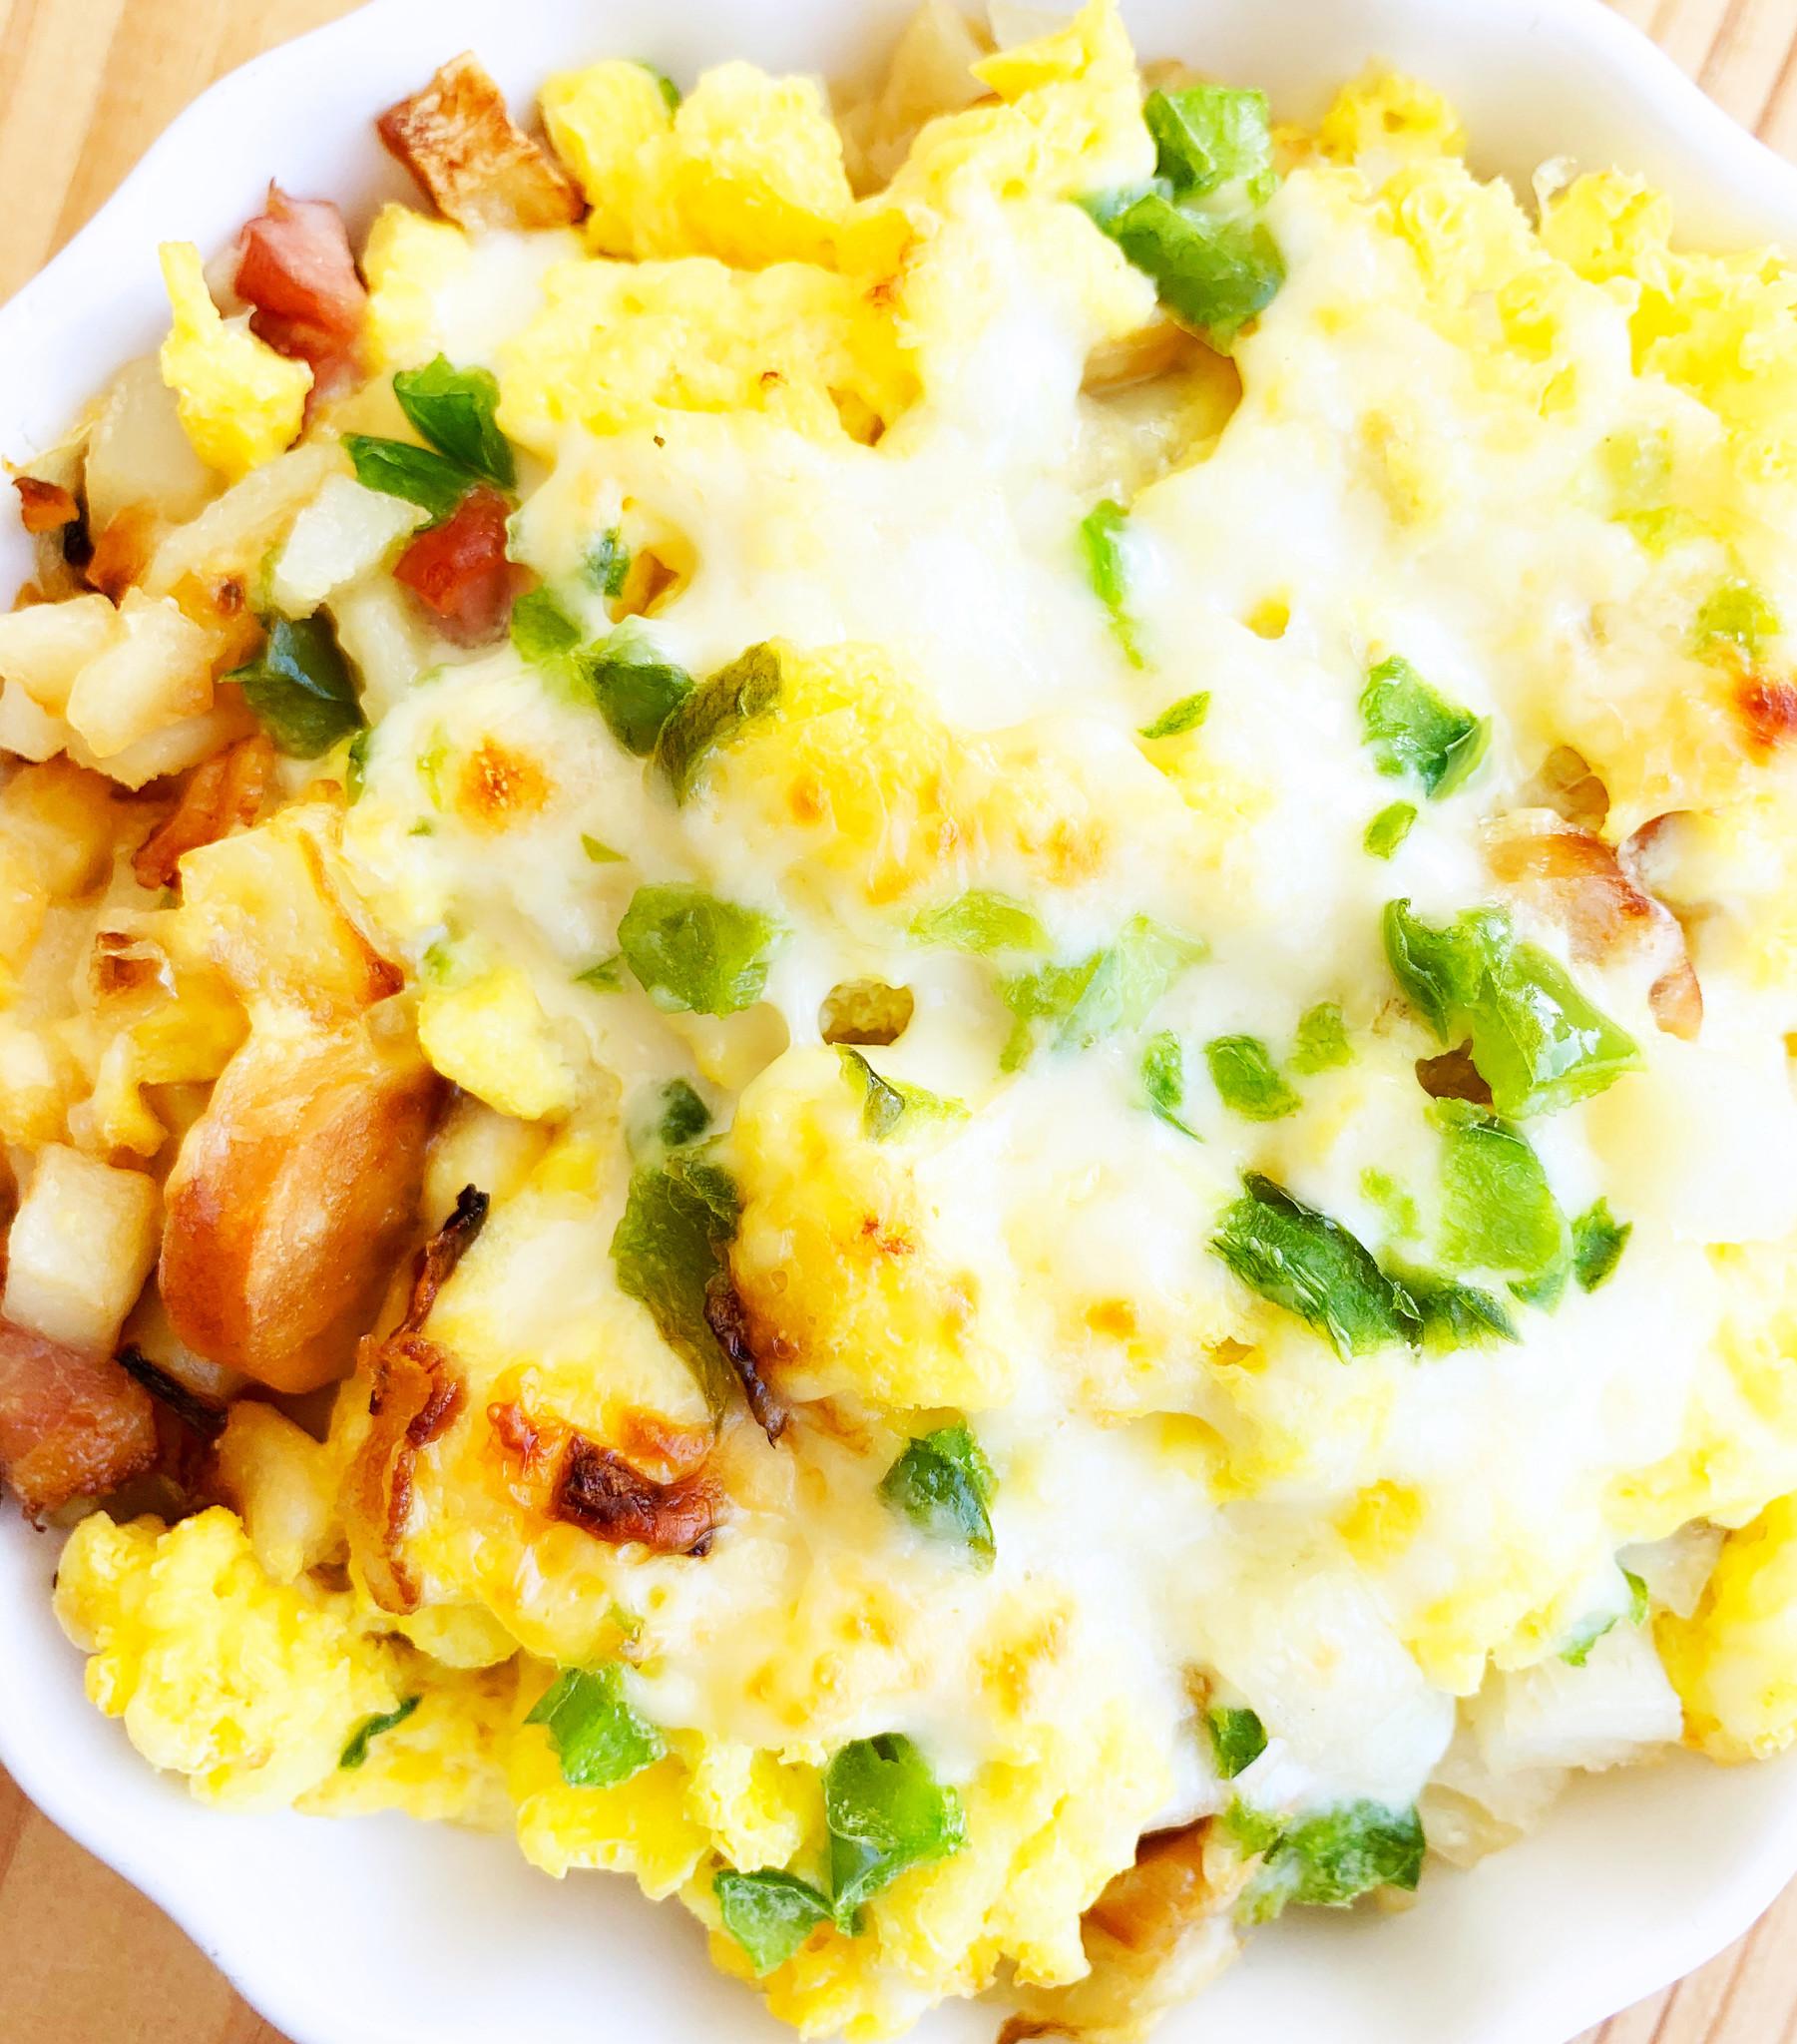 Peasant-style breakfast cassolette